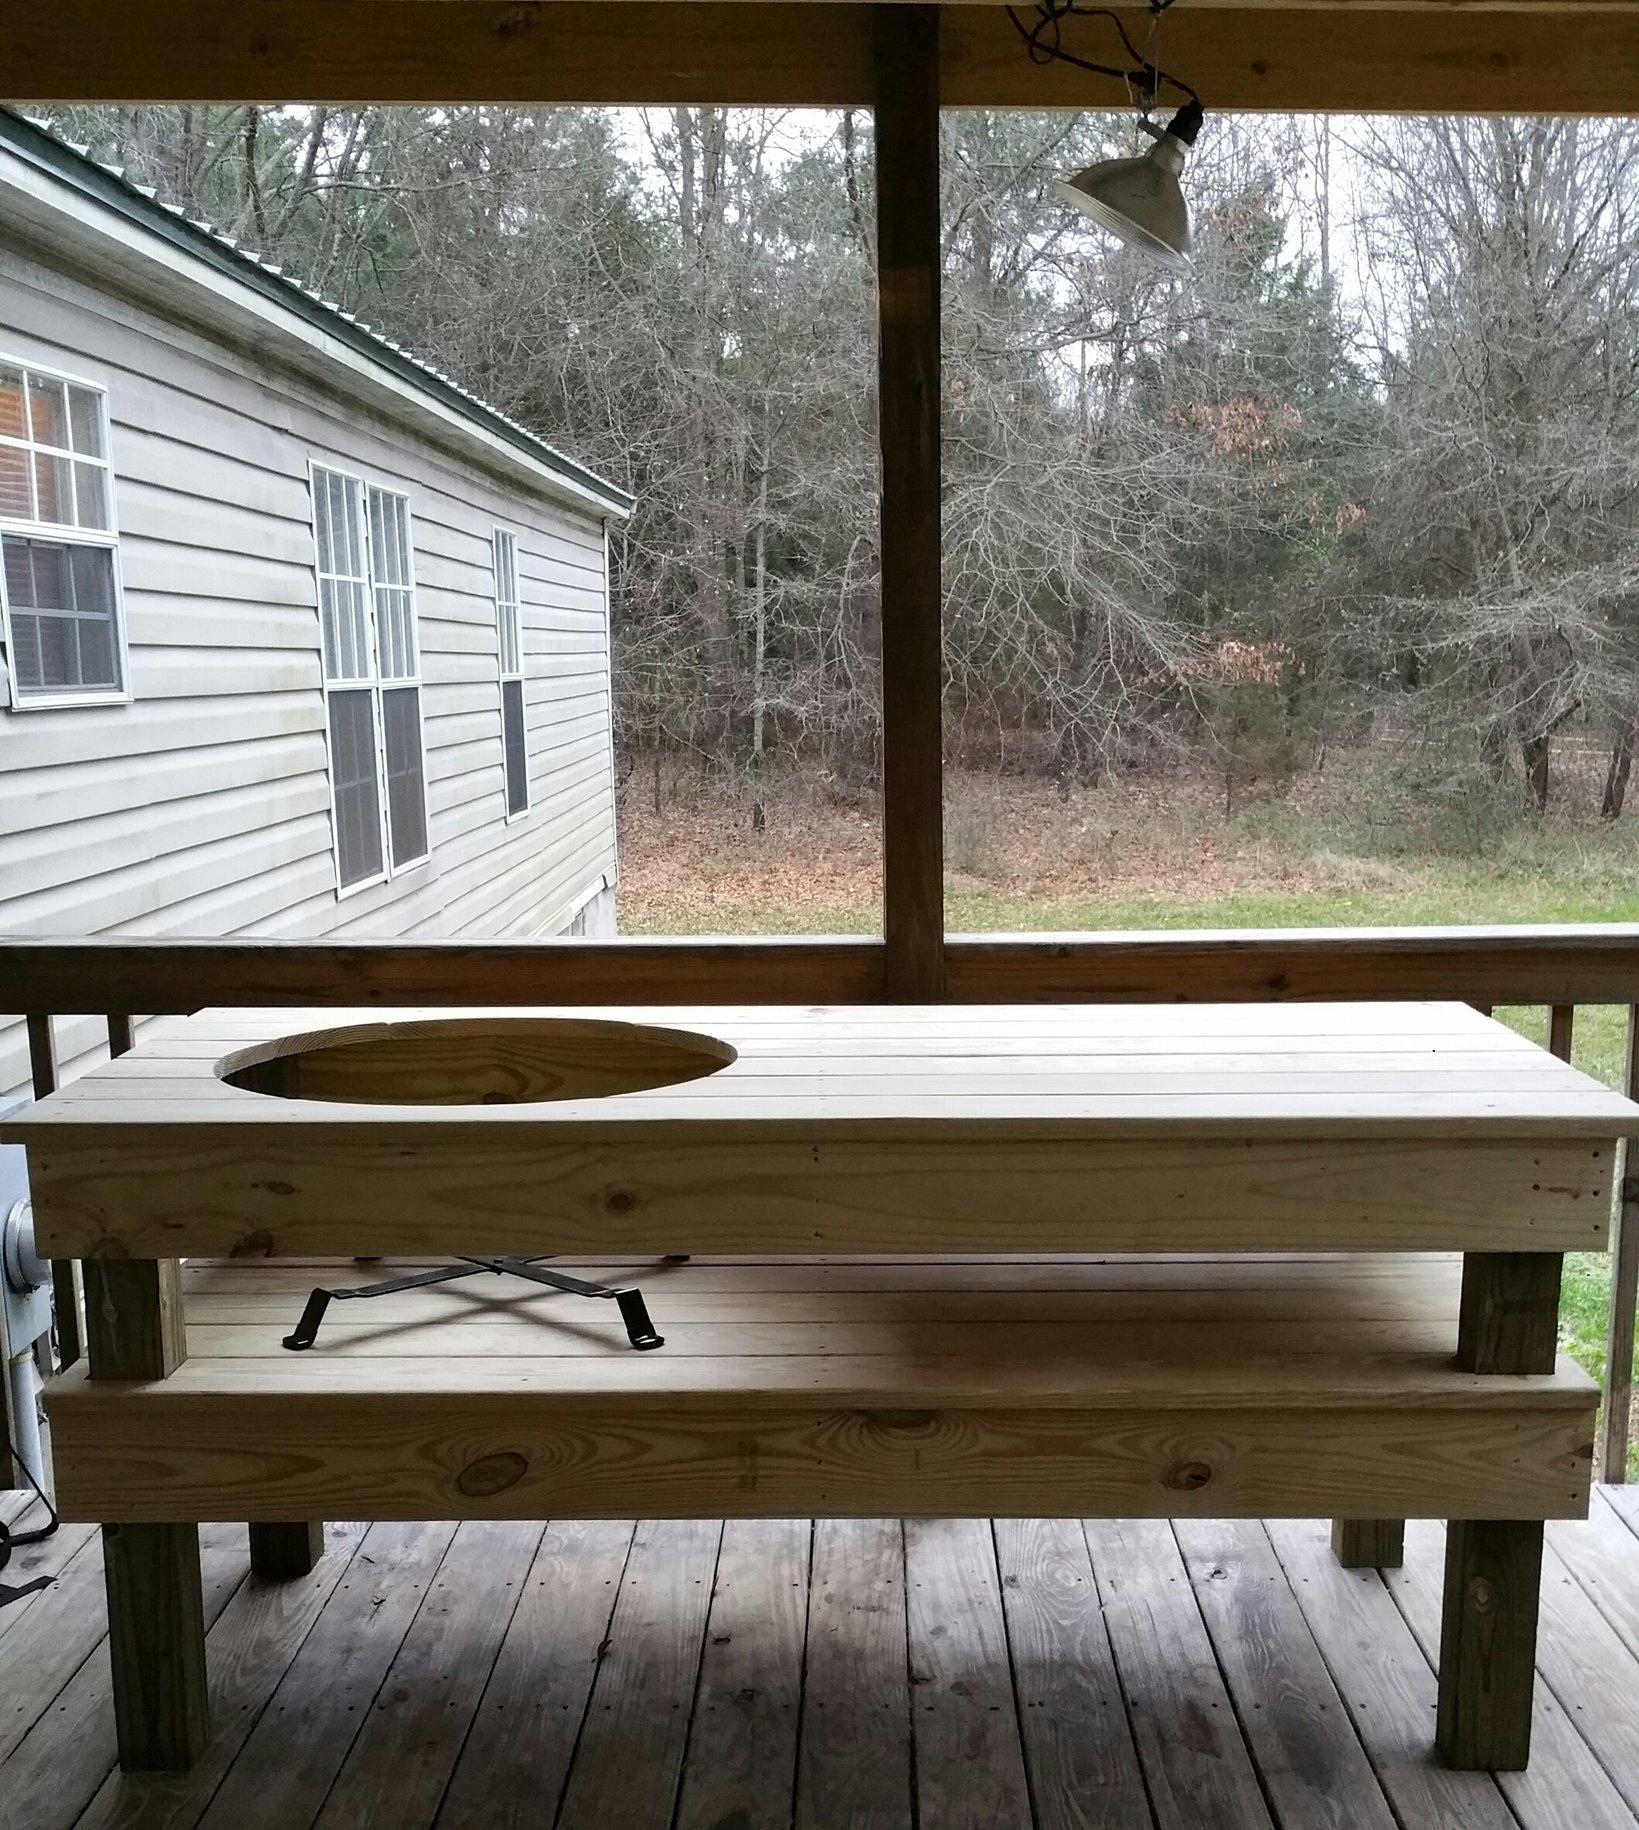 Pressure Treated XL Table Big Green Egg EGGhead Forum The - Pressure treated wood picnic table